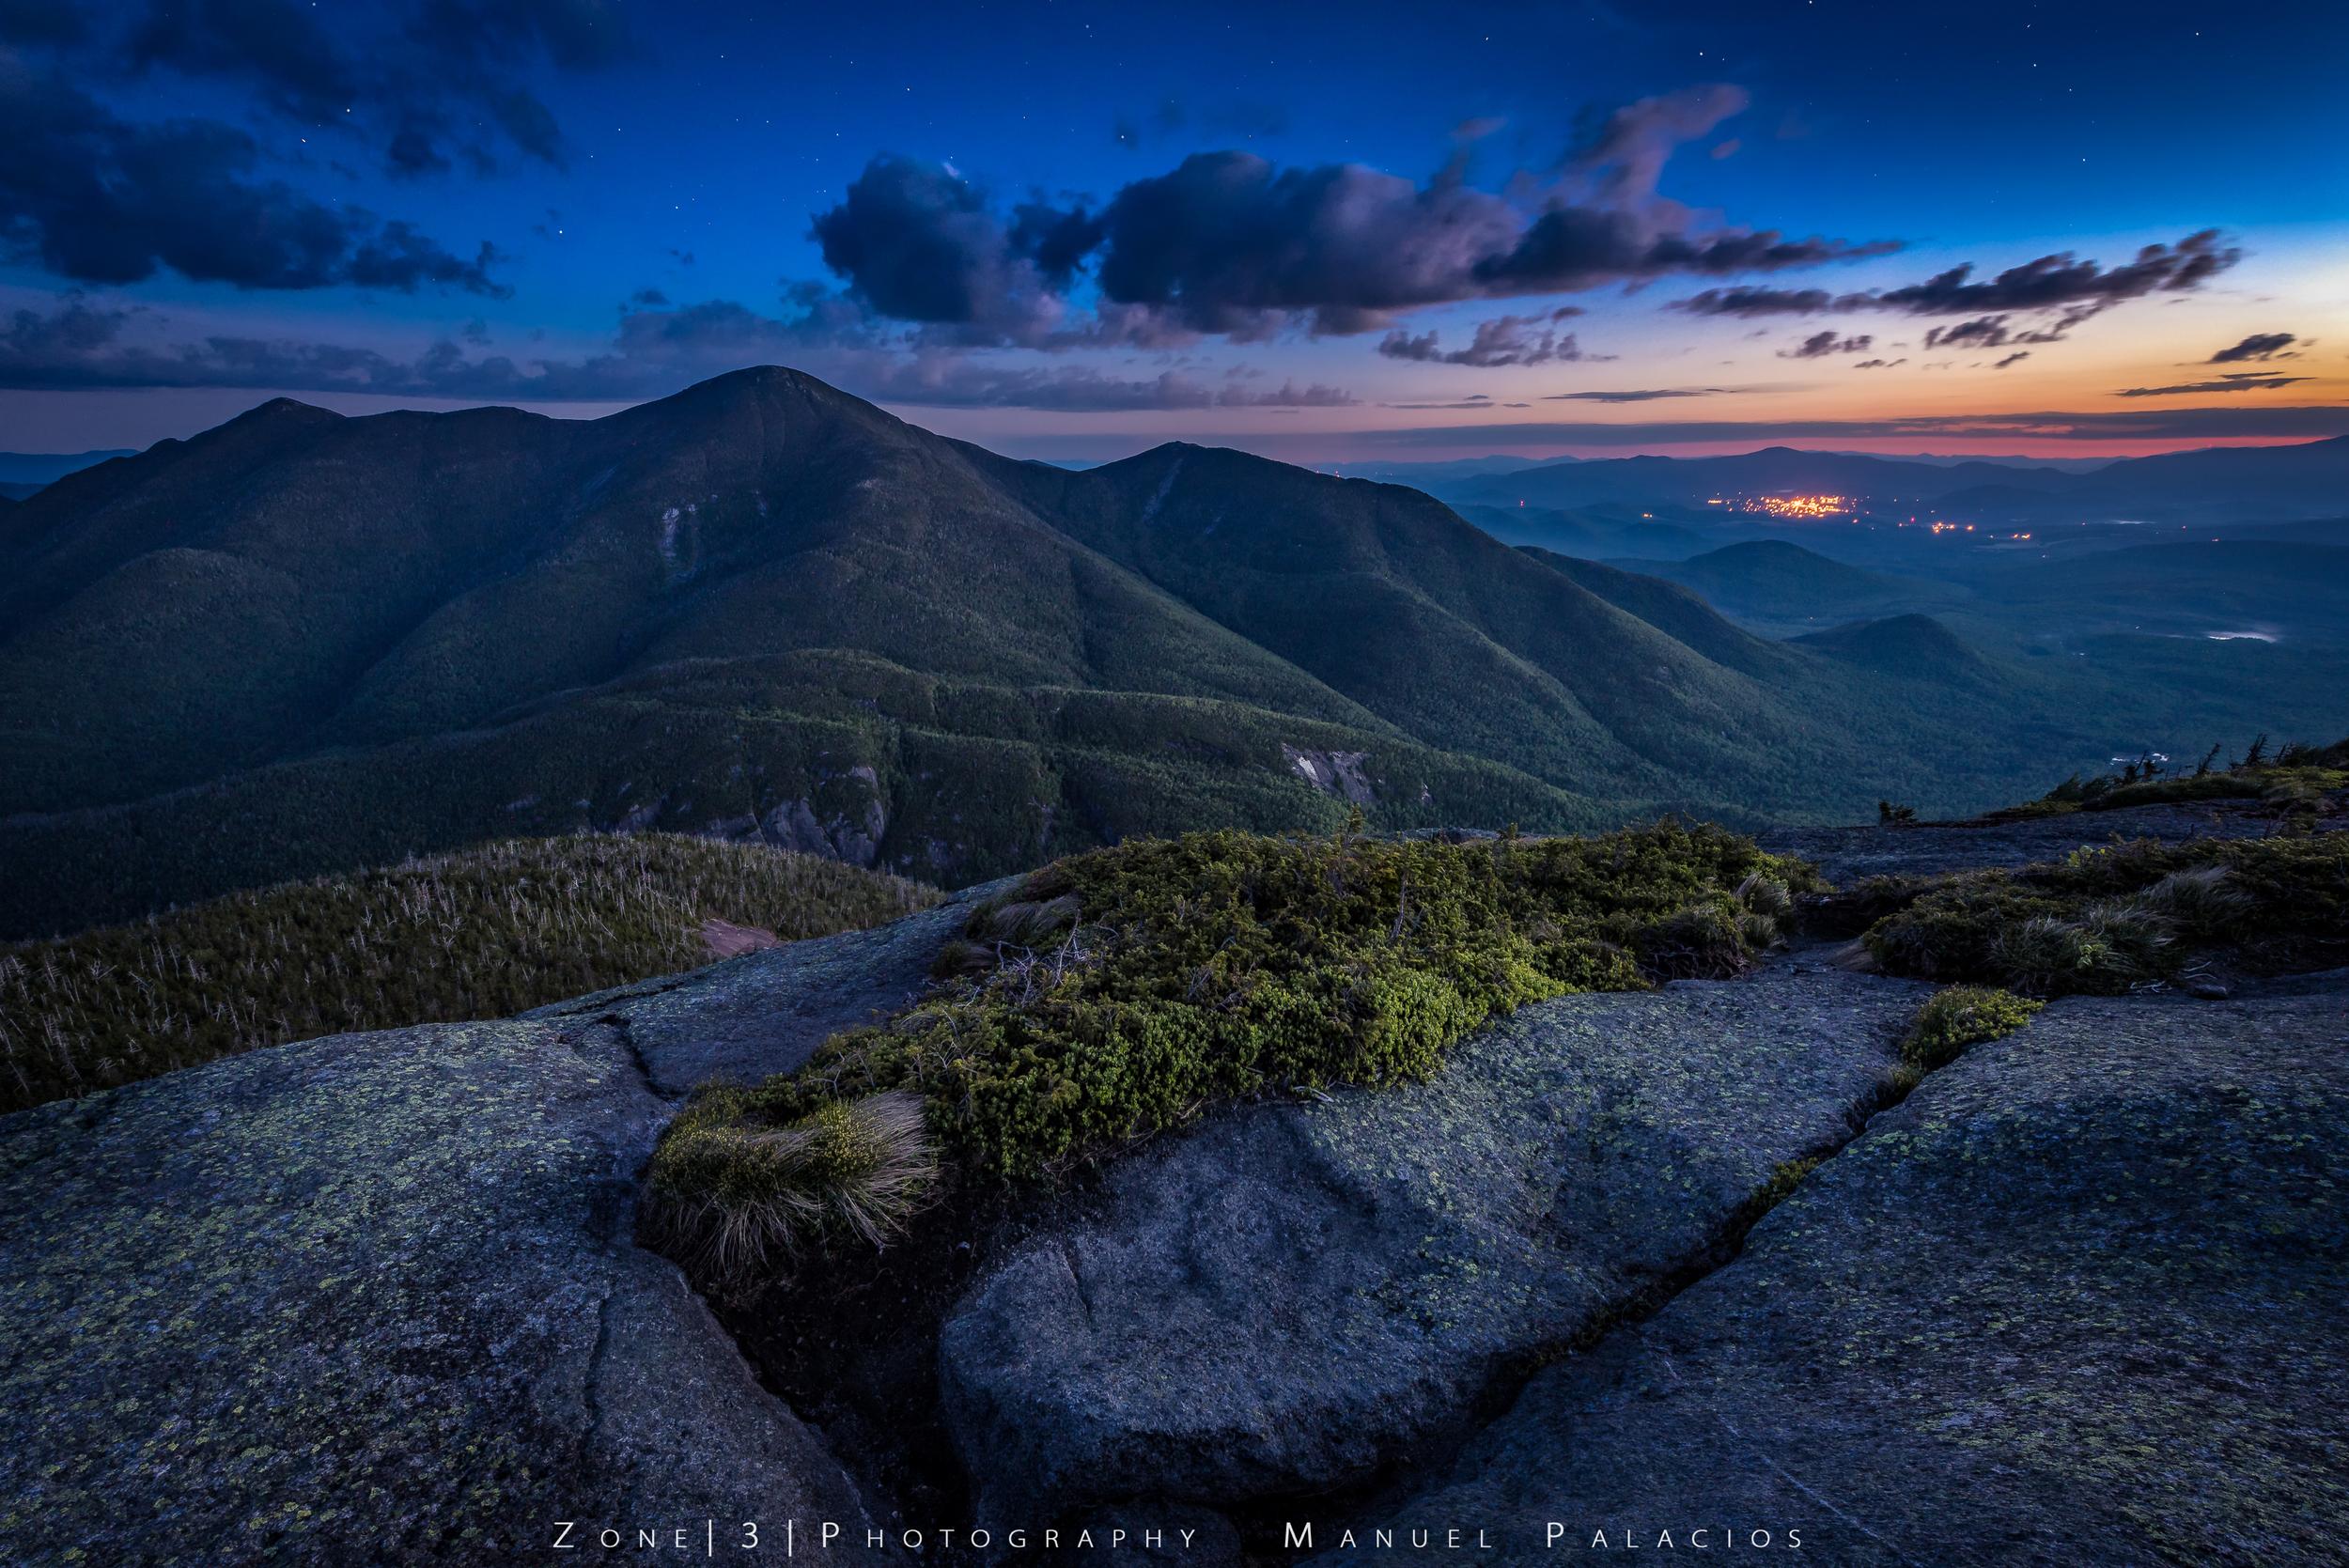 The McIntyre Range Twilight - Colden Mt, Adirondacks NY